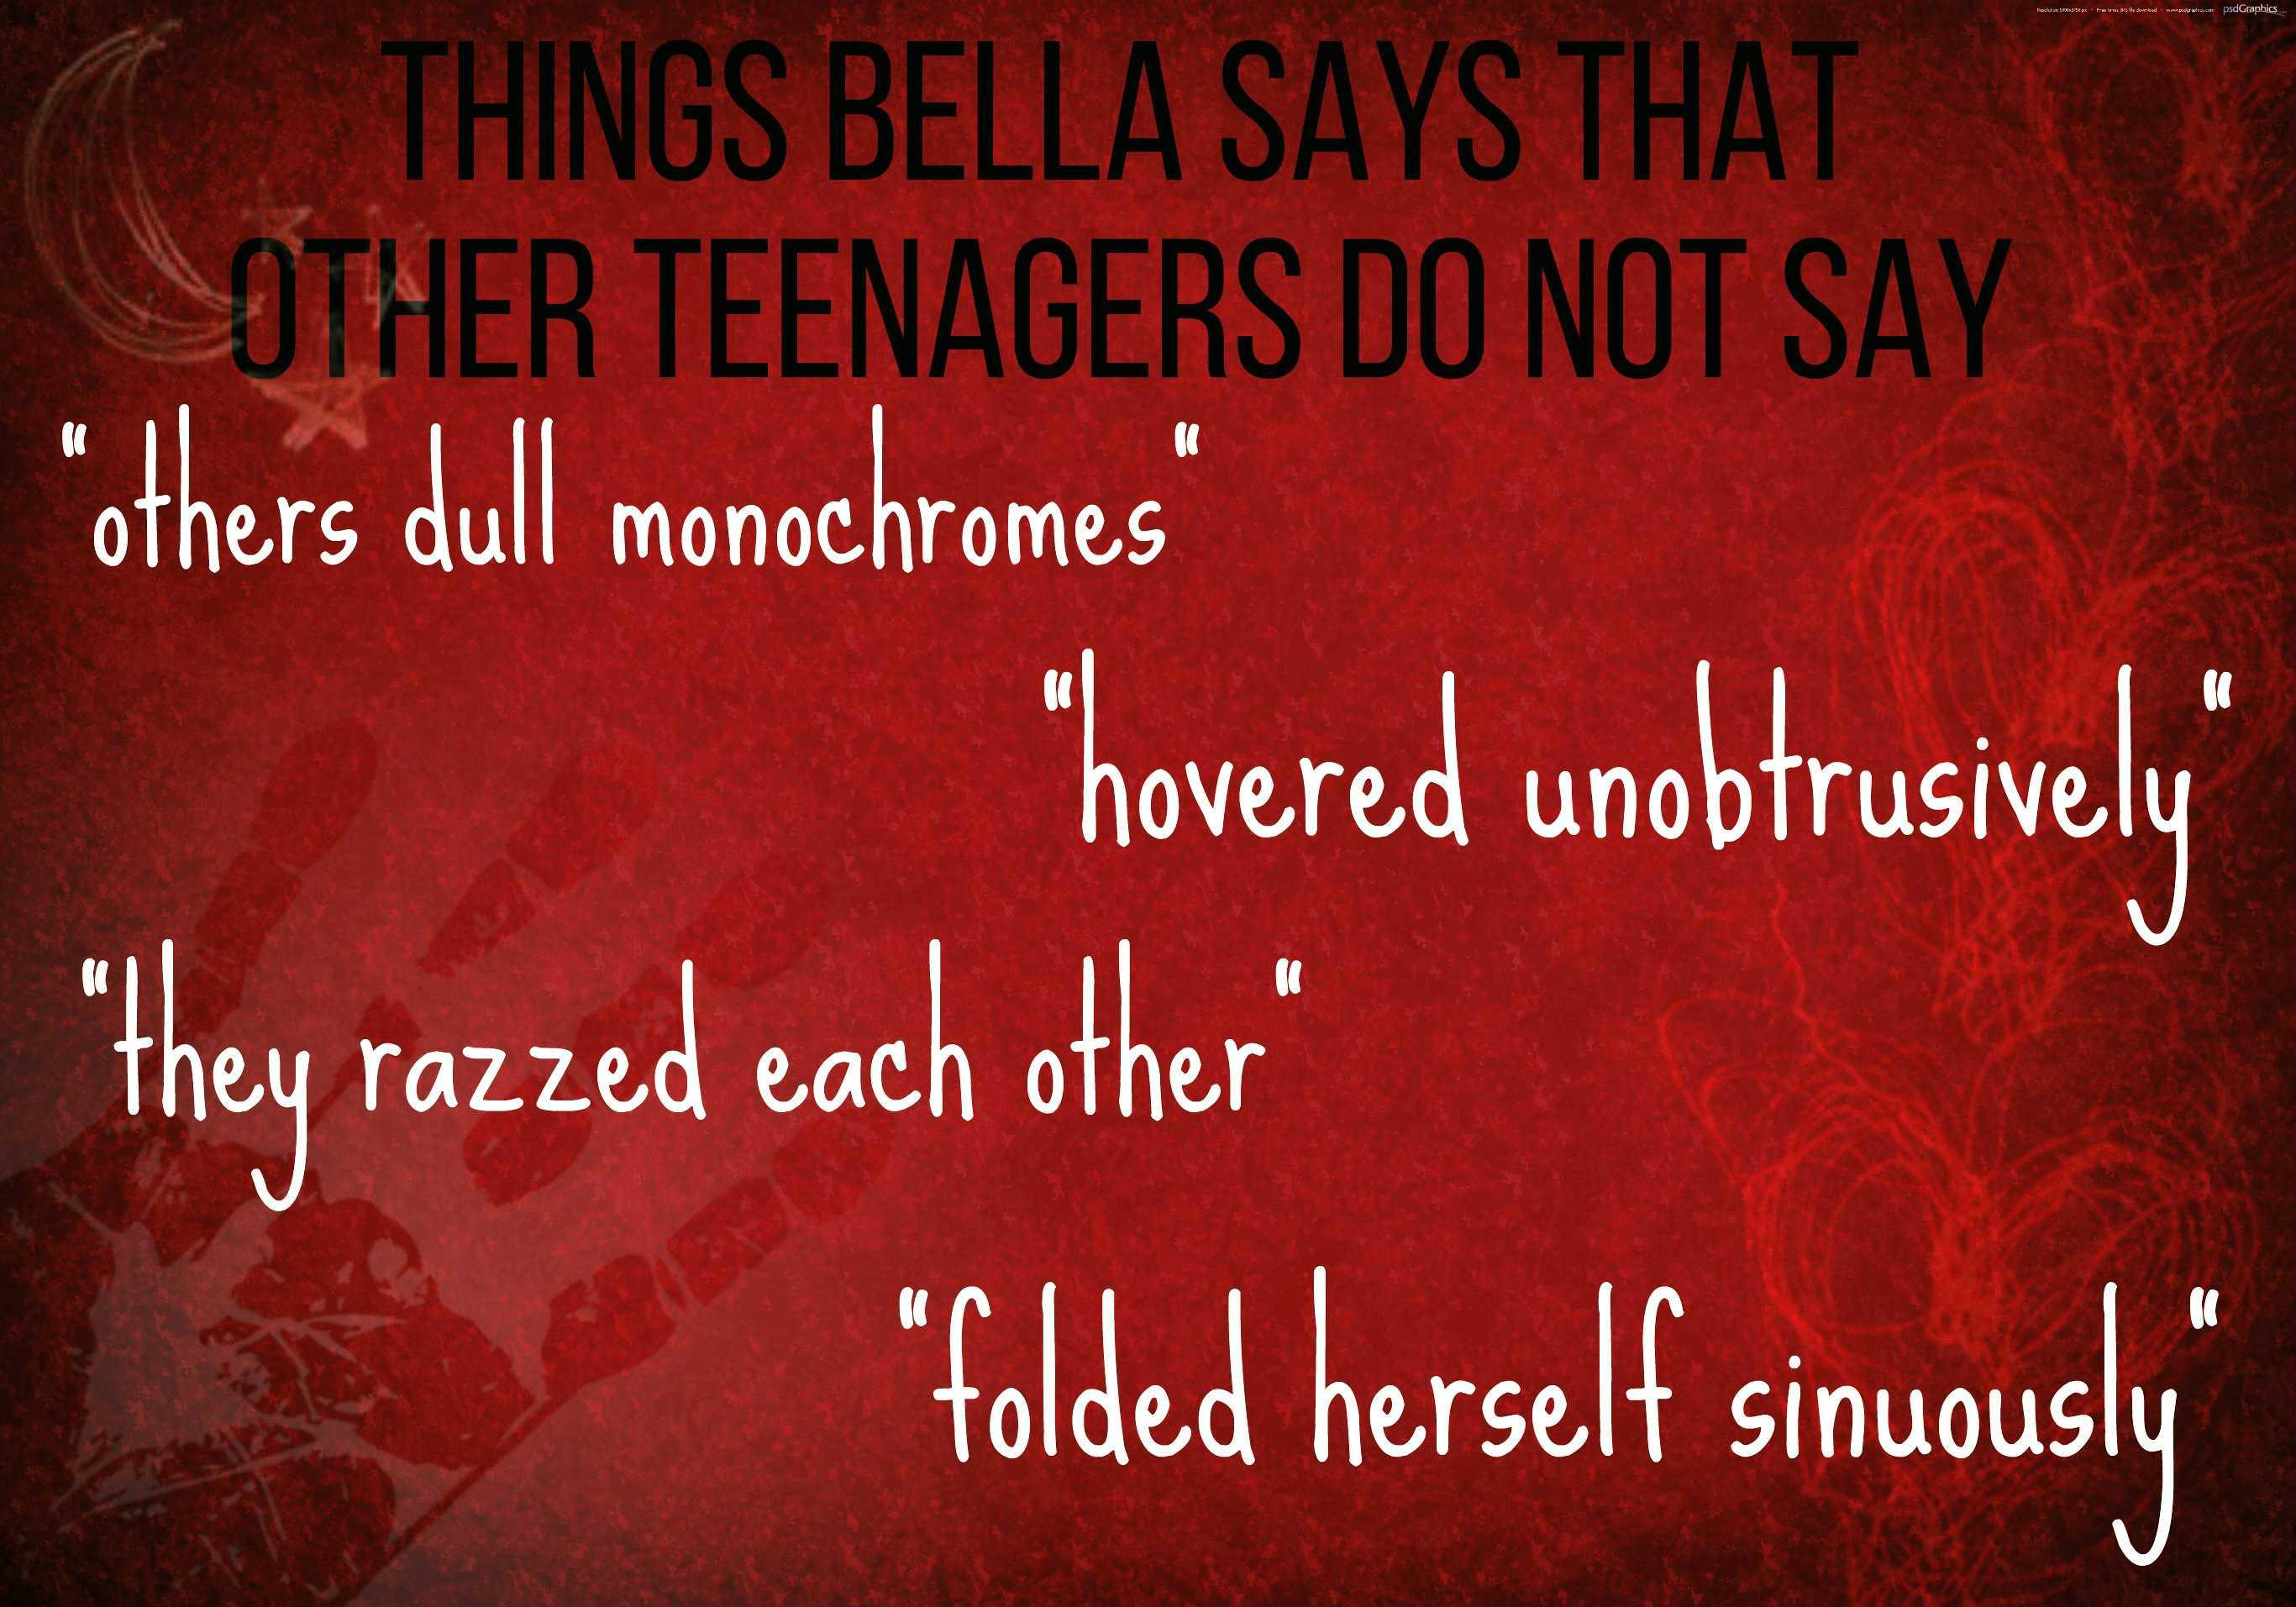 things bella says